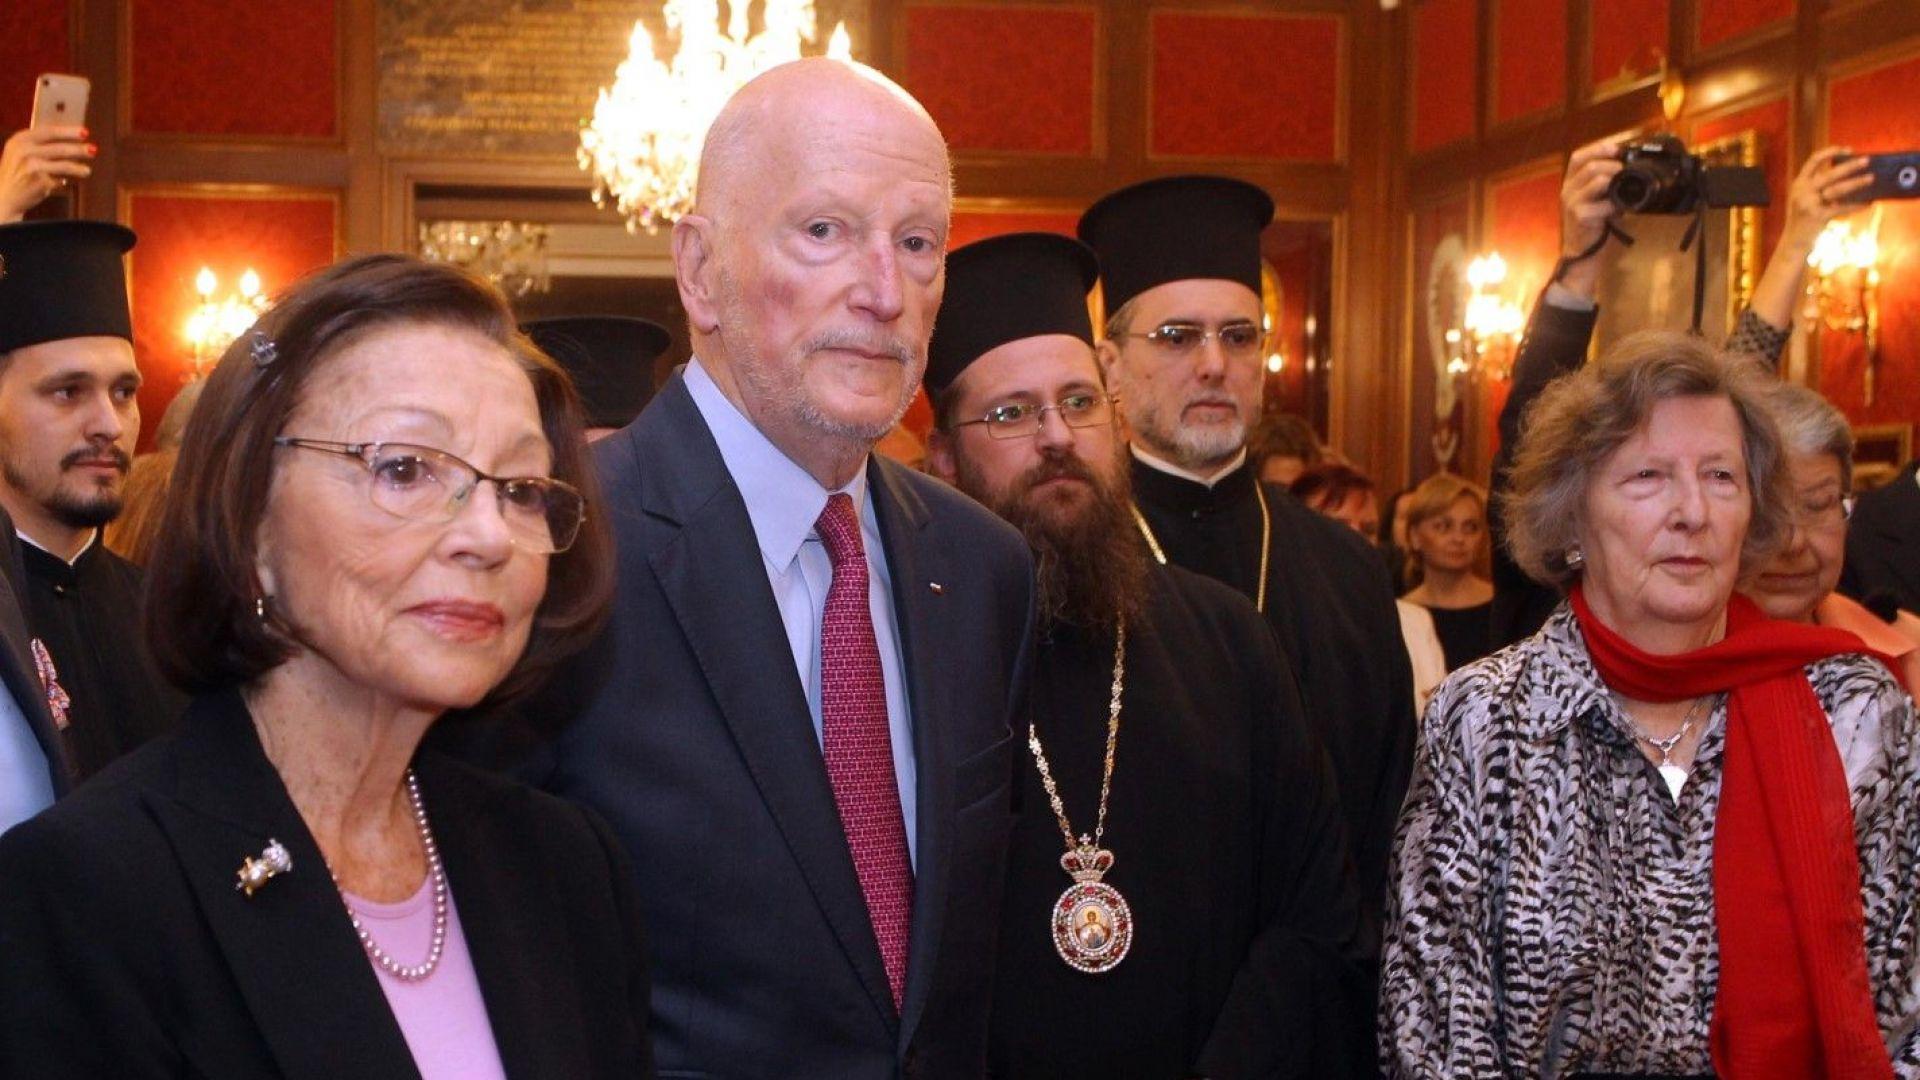 Сакскобургготски представи албум за царското семейство